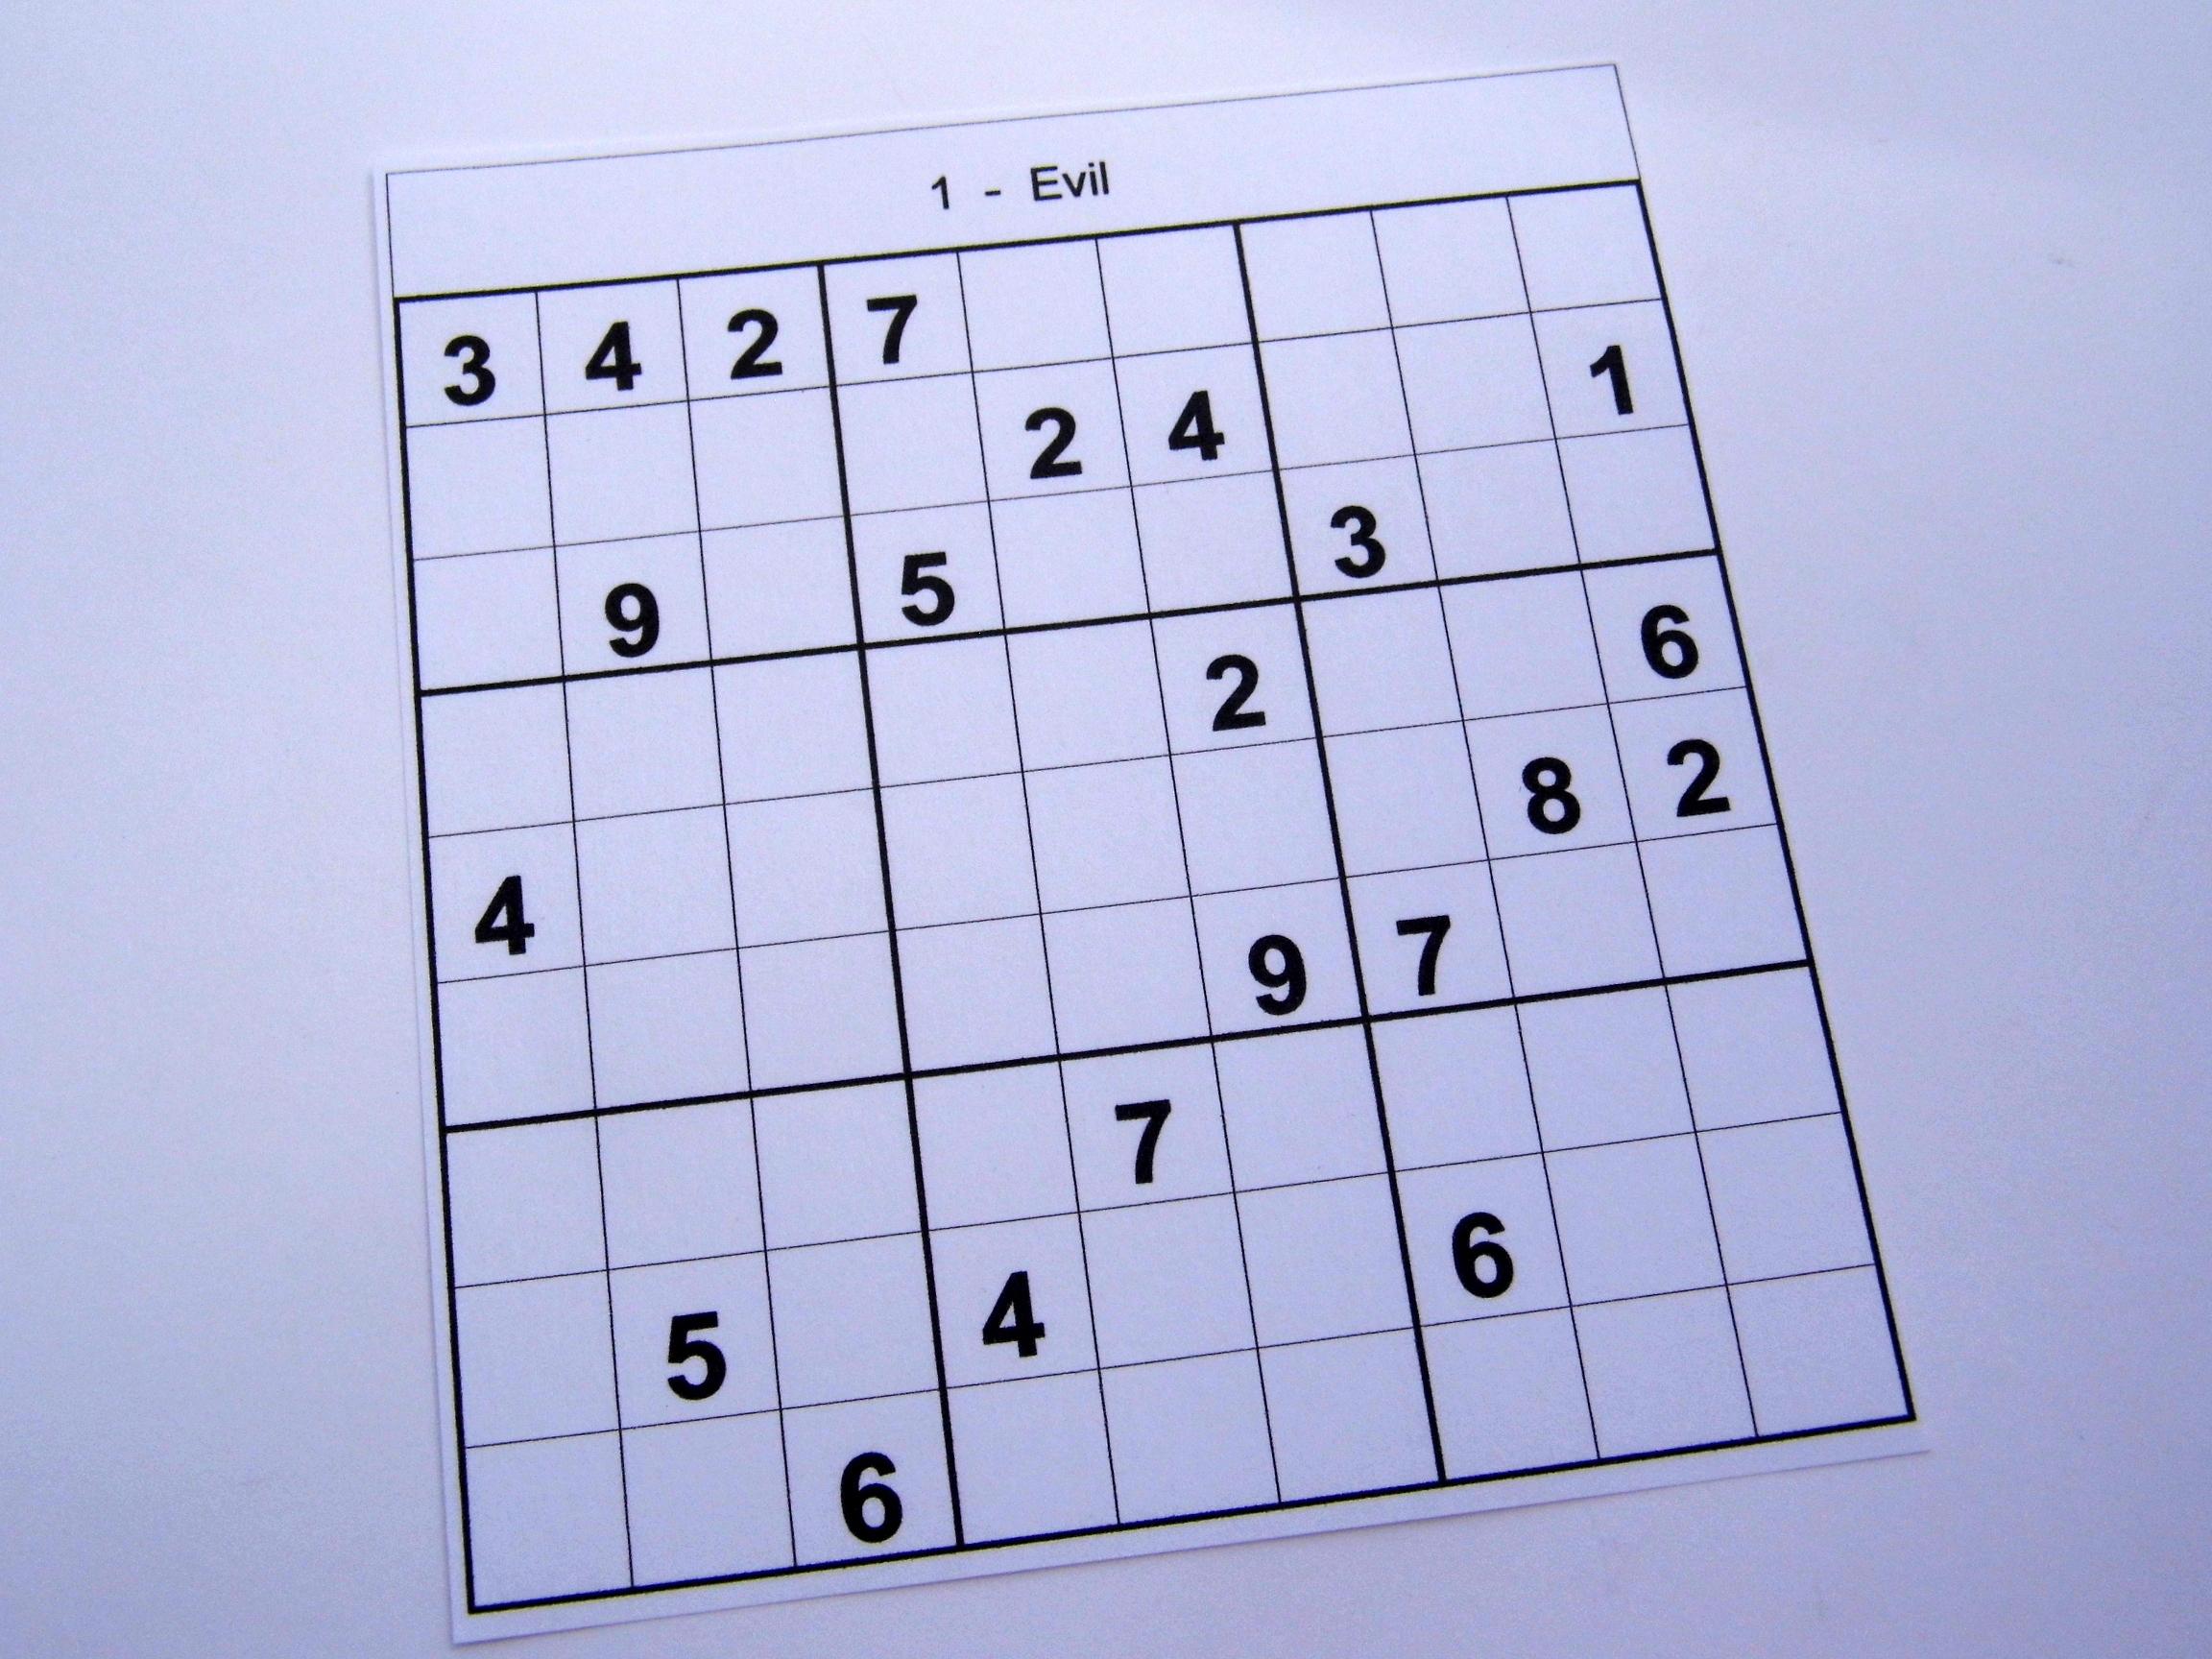 Hard Printable Sudoku Puzzles 2 Per Page – Book 1 – Free Sudoku Puzzles - Printable Sudoku Puzzles 1 Per Page